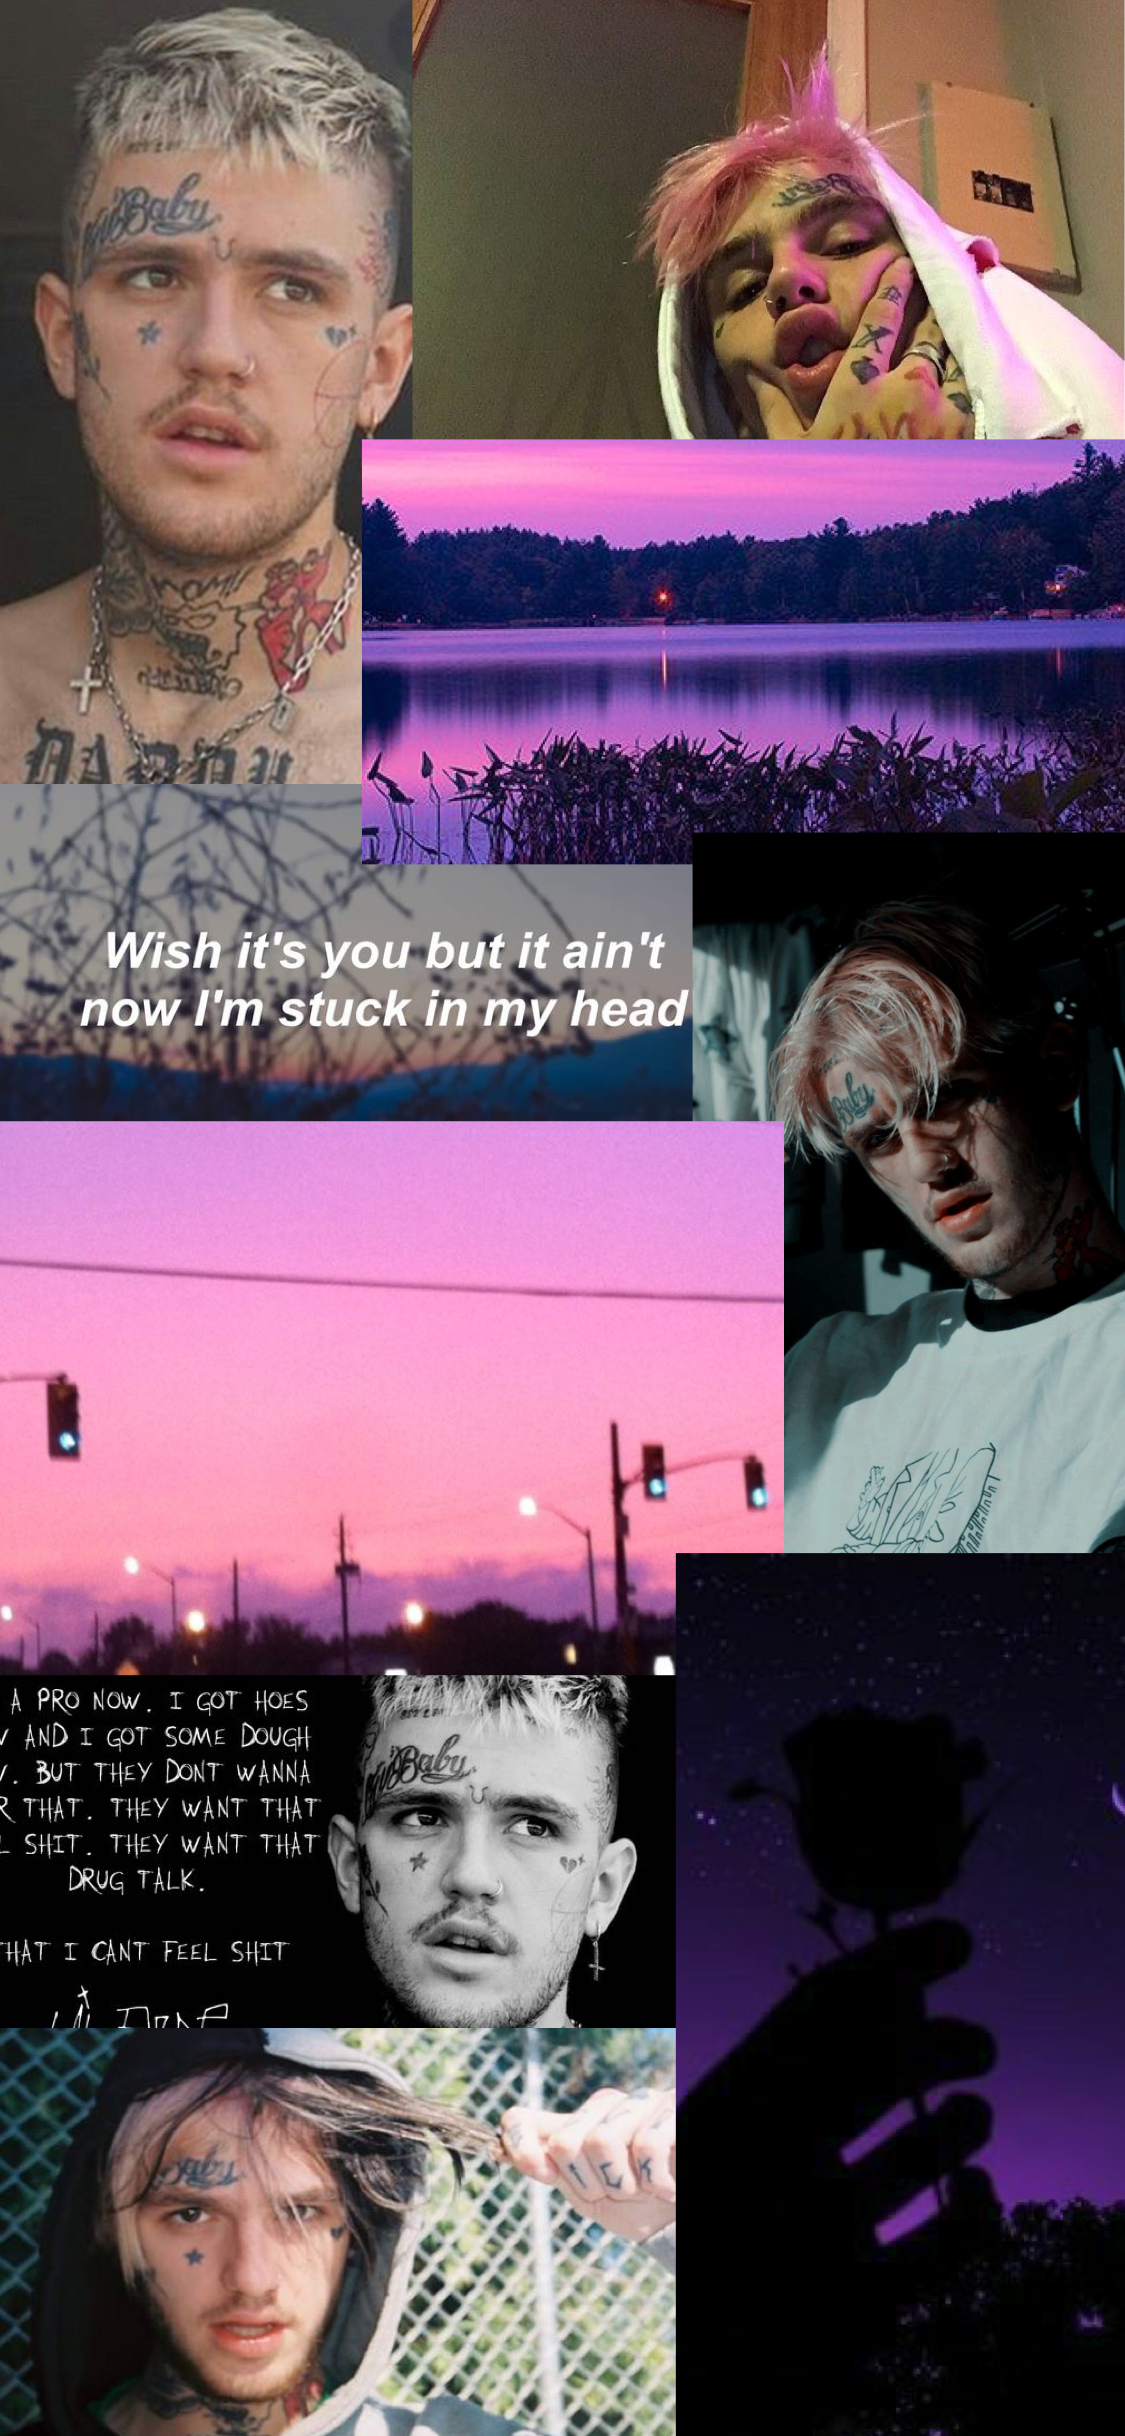 Lil Peep Iphone 11 Pro Wallpaper In 2020 Lil Peep Beamerboy Lil Peep Hellboy My Chemical Romance Wallpaper